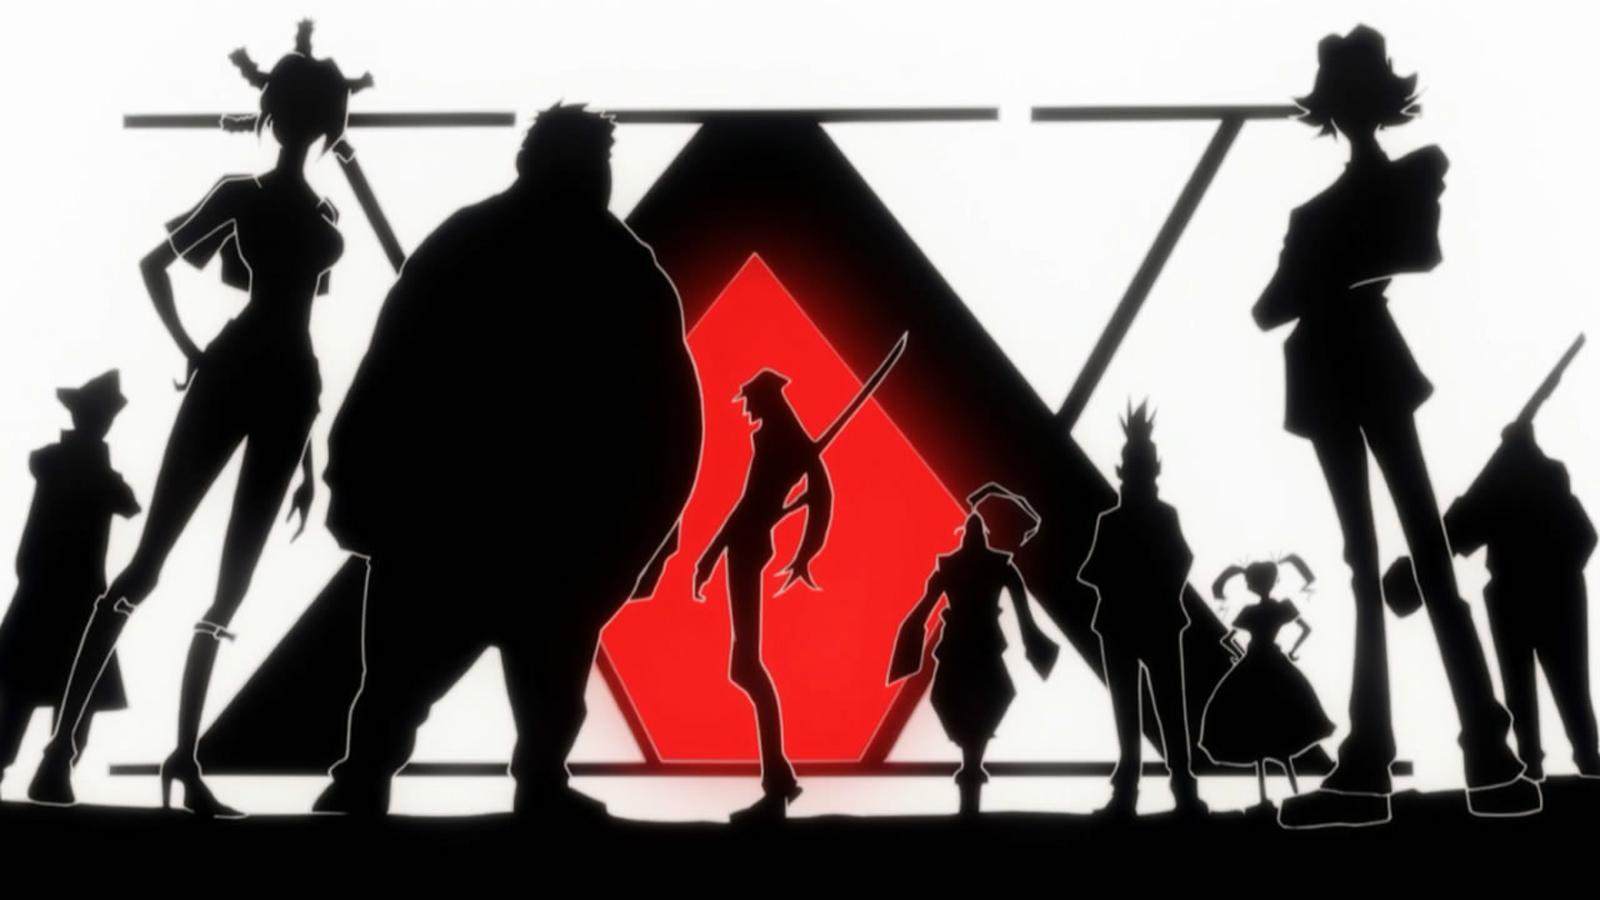 Free download Hunter X Hunter 2011 Anime HD Wallpaper ...